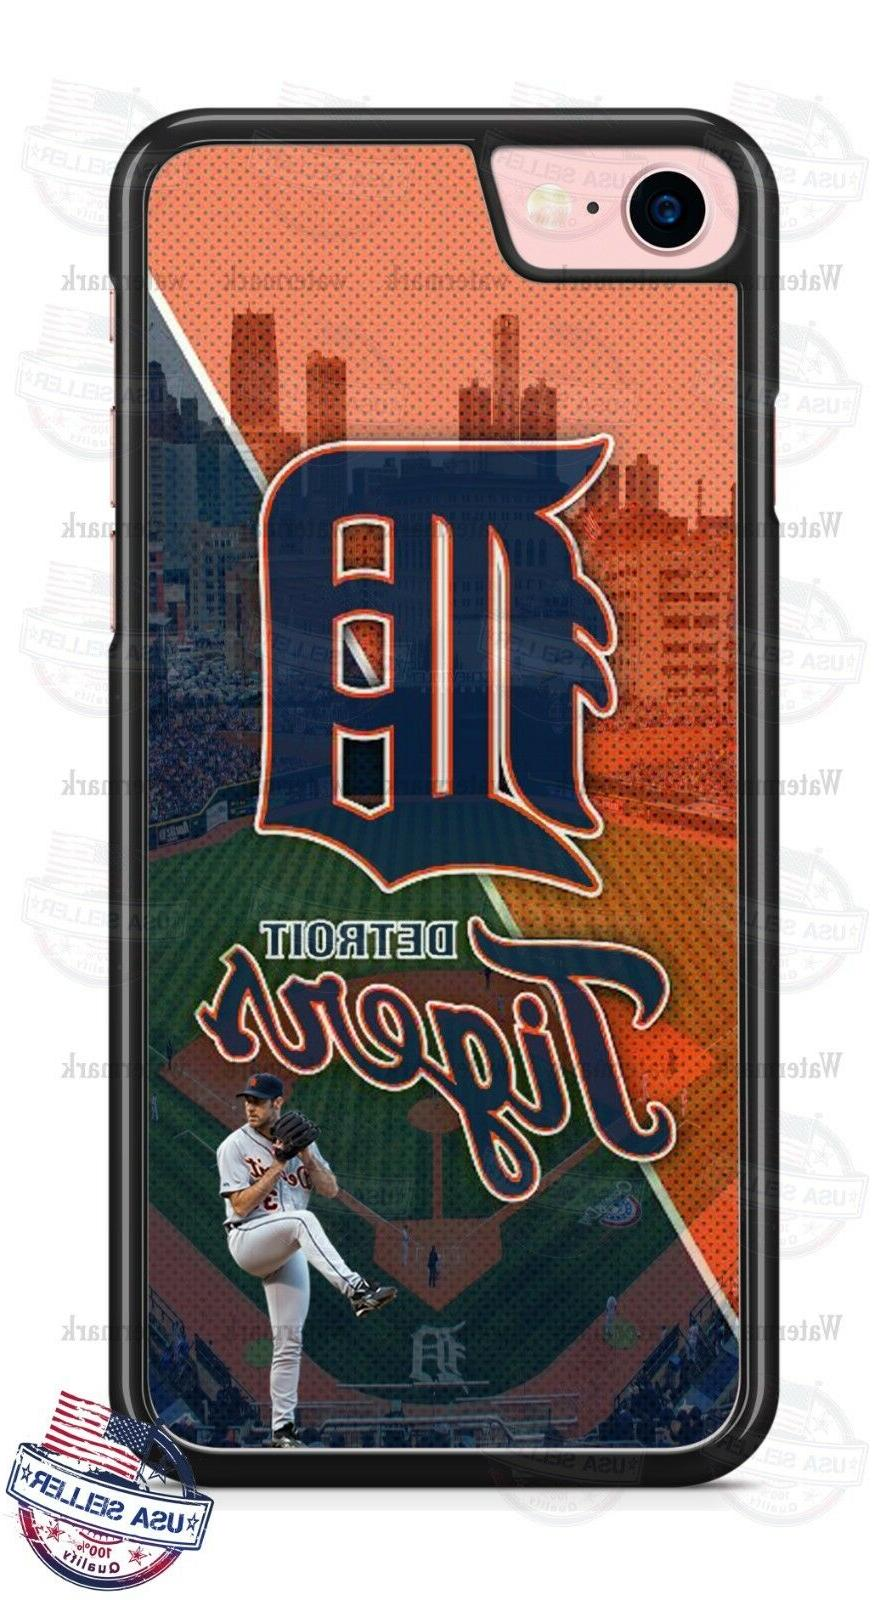 detroit tigers baseball stadium design phone case